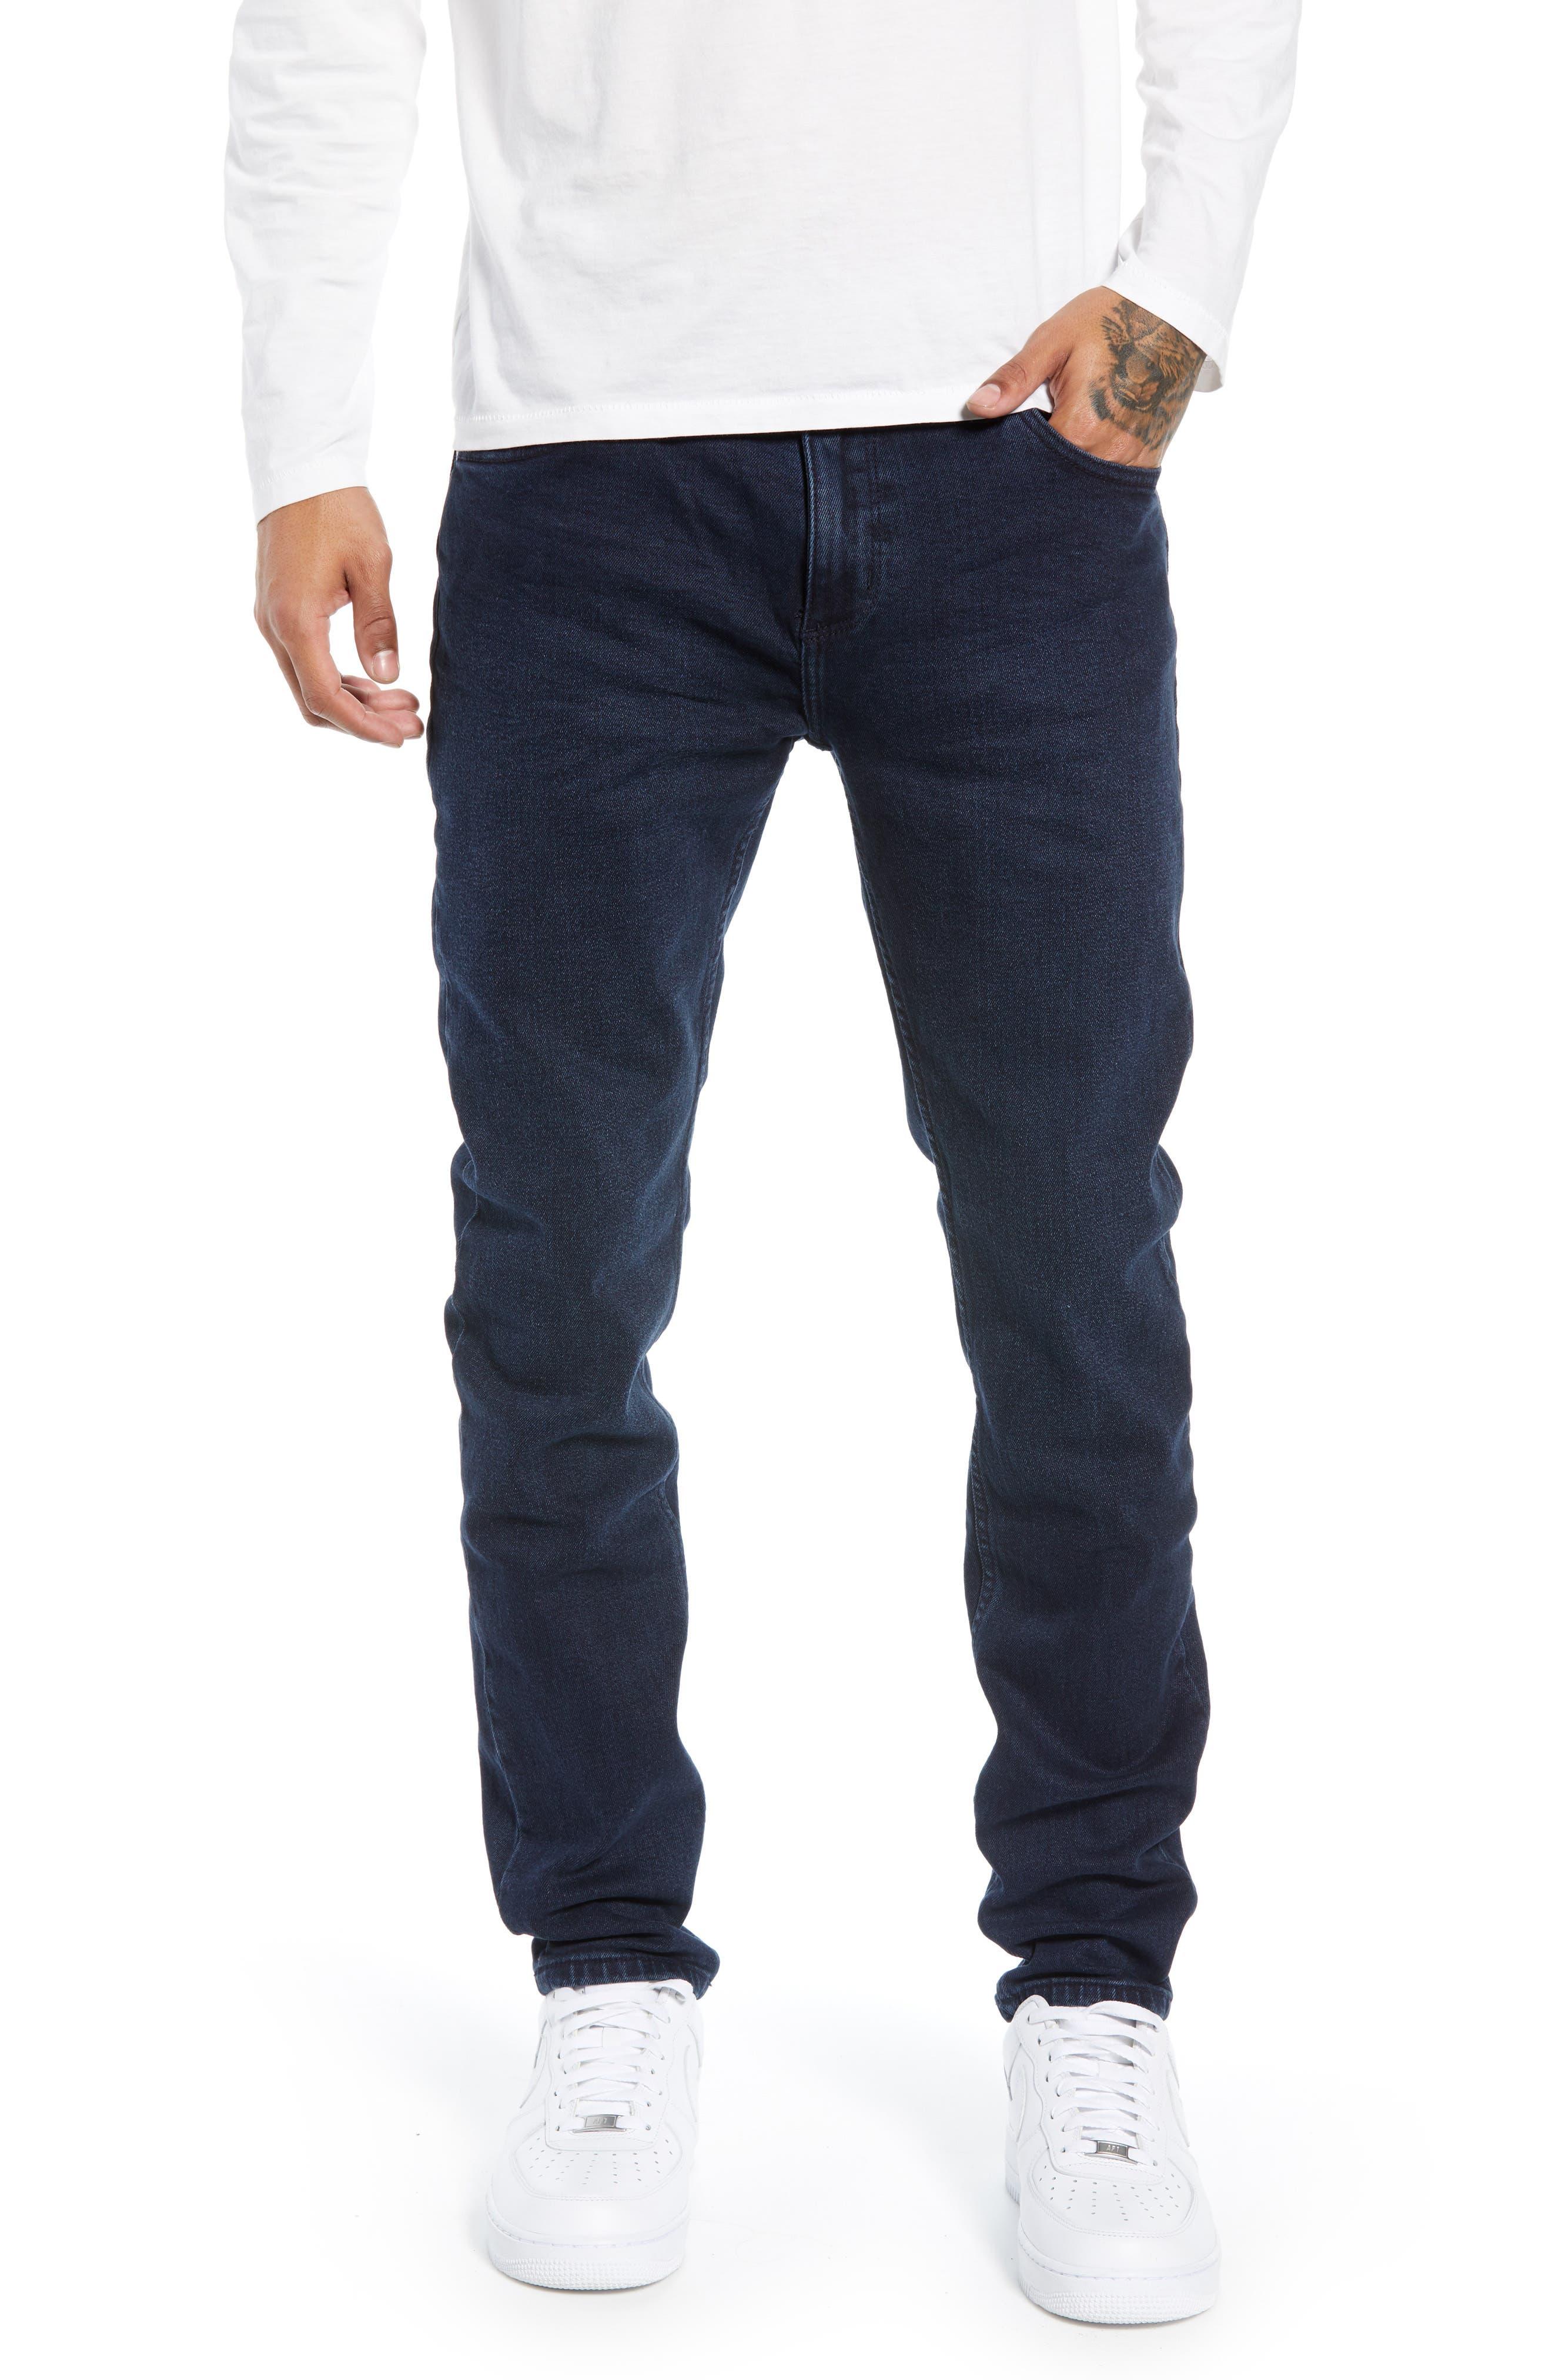 Stinger Skinny Fit Jeans,                             Main thumbnail 1, color,                             STONE FREE BLUE